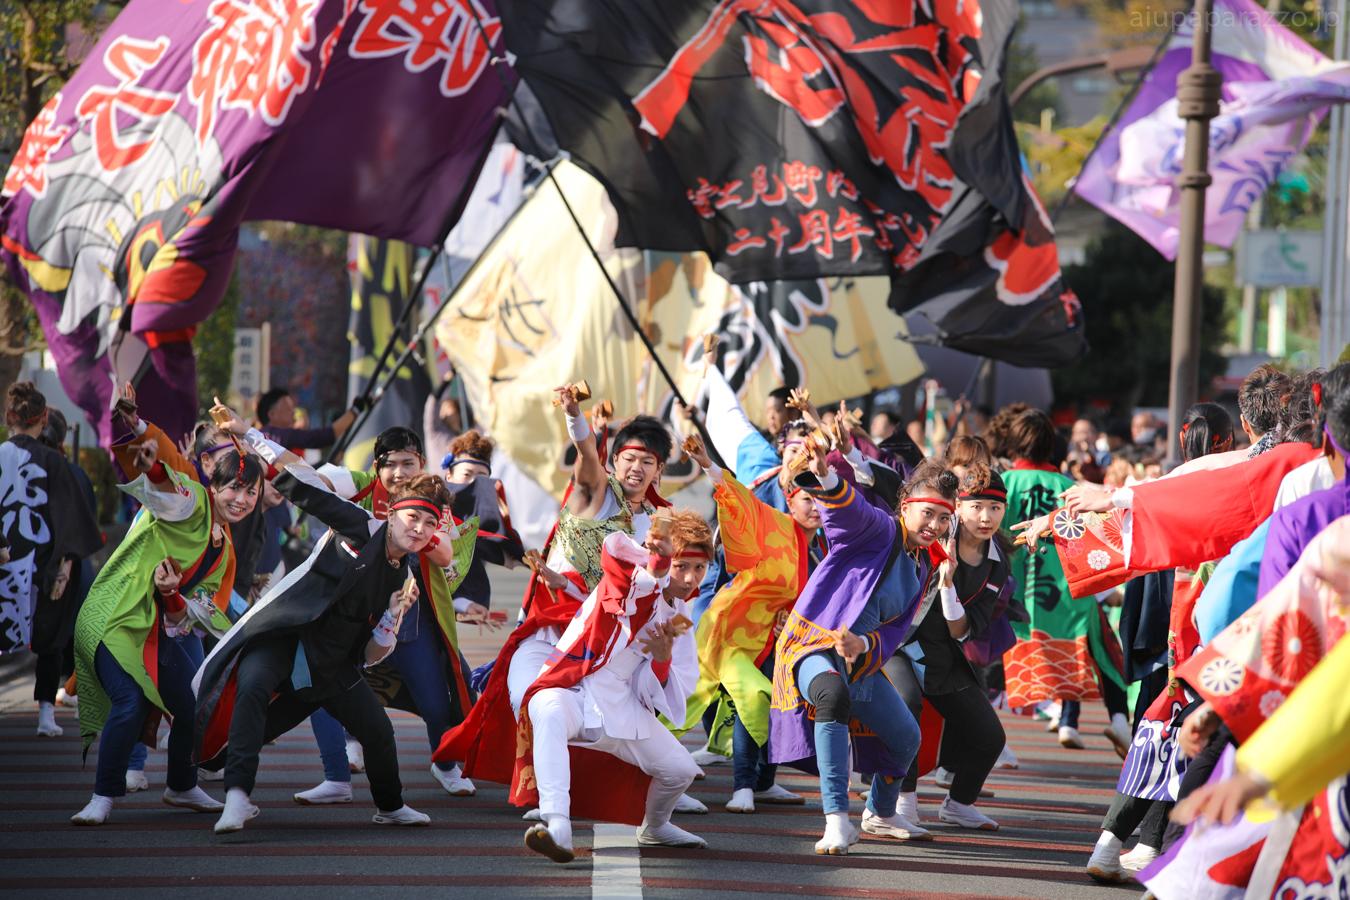 kanpachi2016oyachai-28.jpg